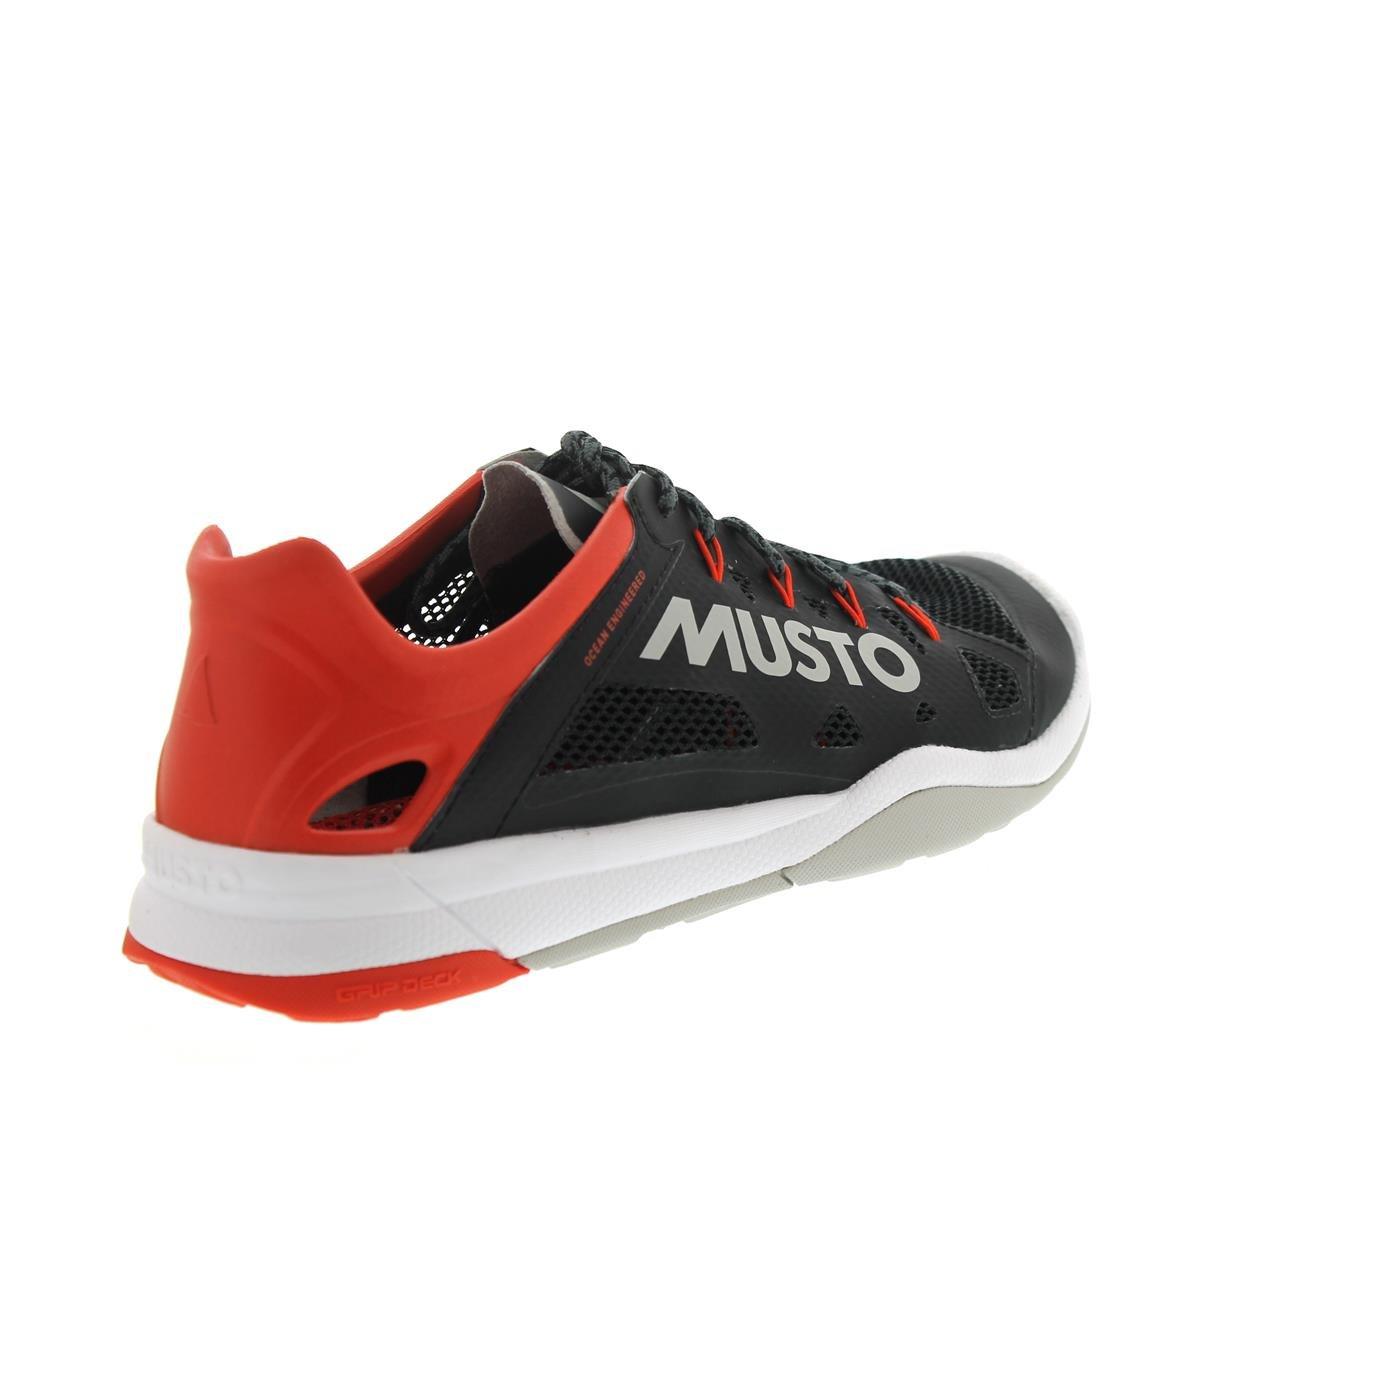 Musto 2018 Dynamic Pro Pro Pro II Sailing schuhe schwarz FUFT006 337700